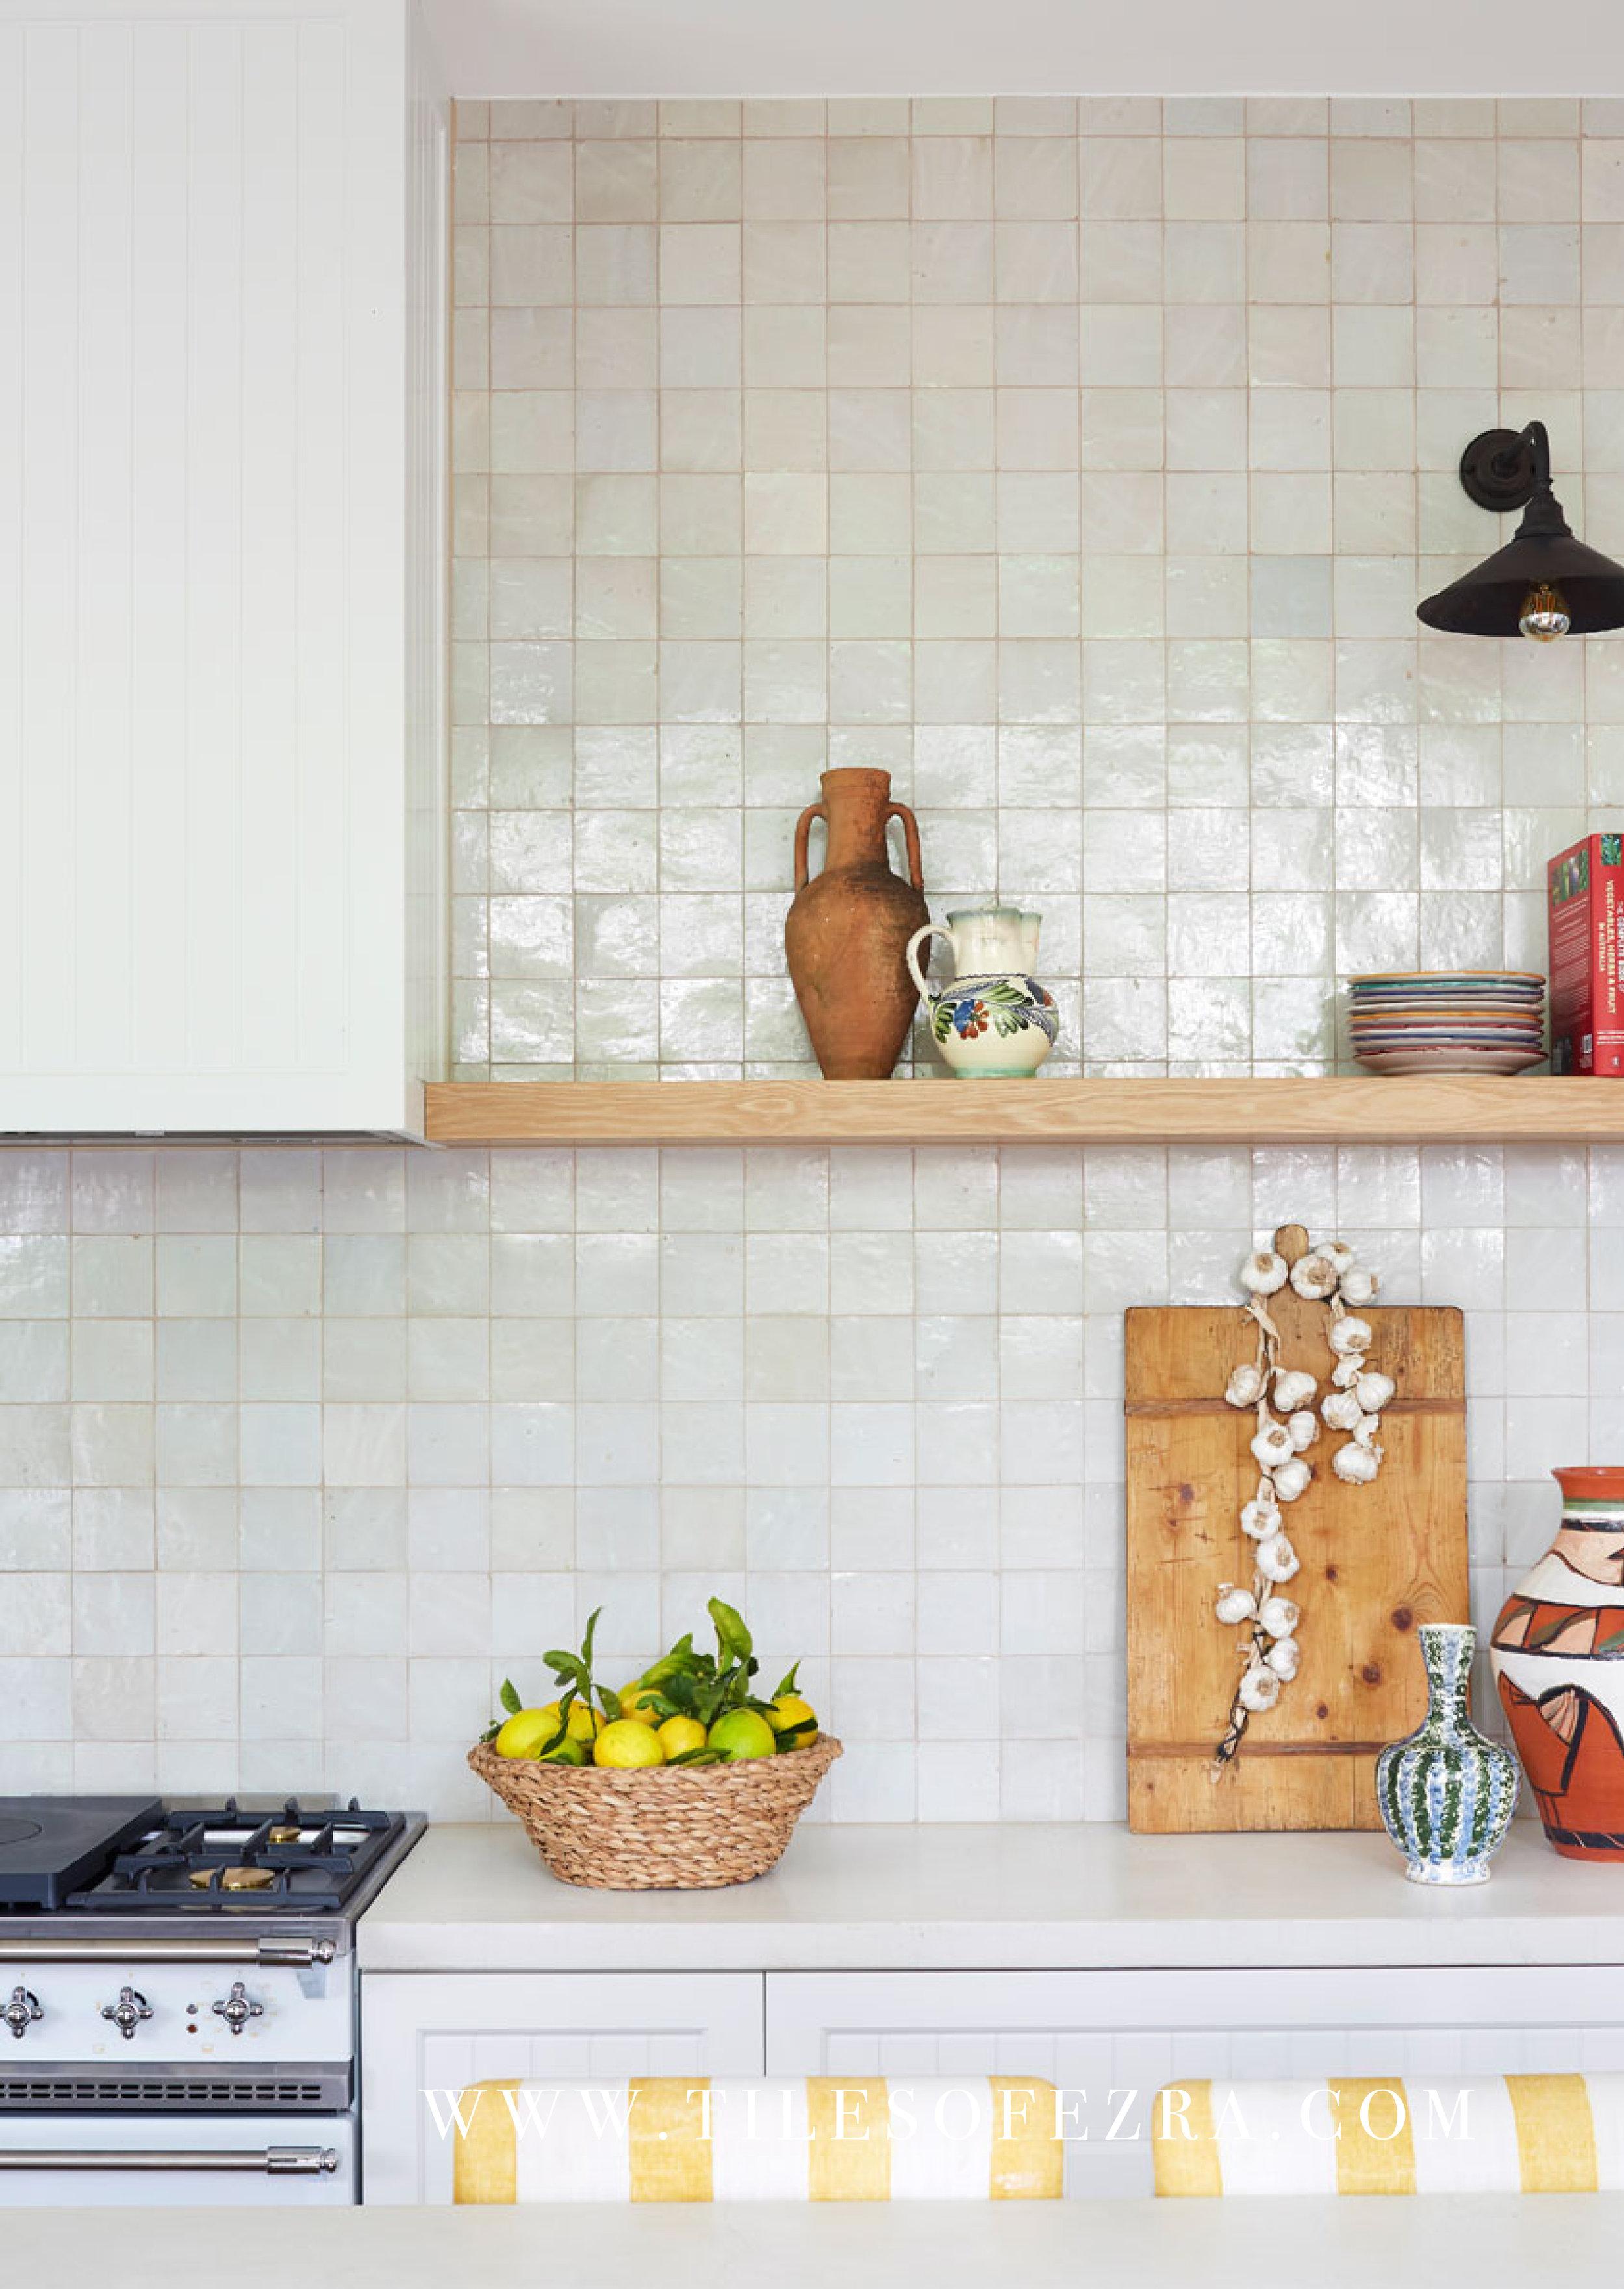 Tilesofezra  white ZEL001B Kitchen. Melbourne-City-House-8_880x1200.jpg